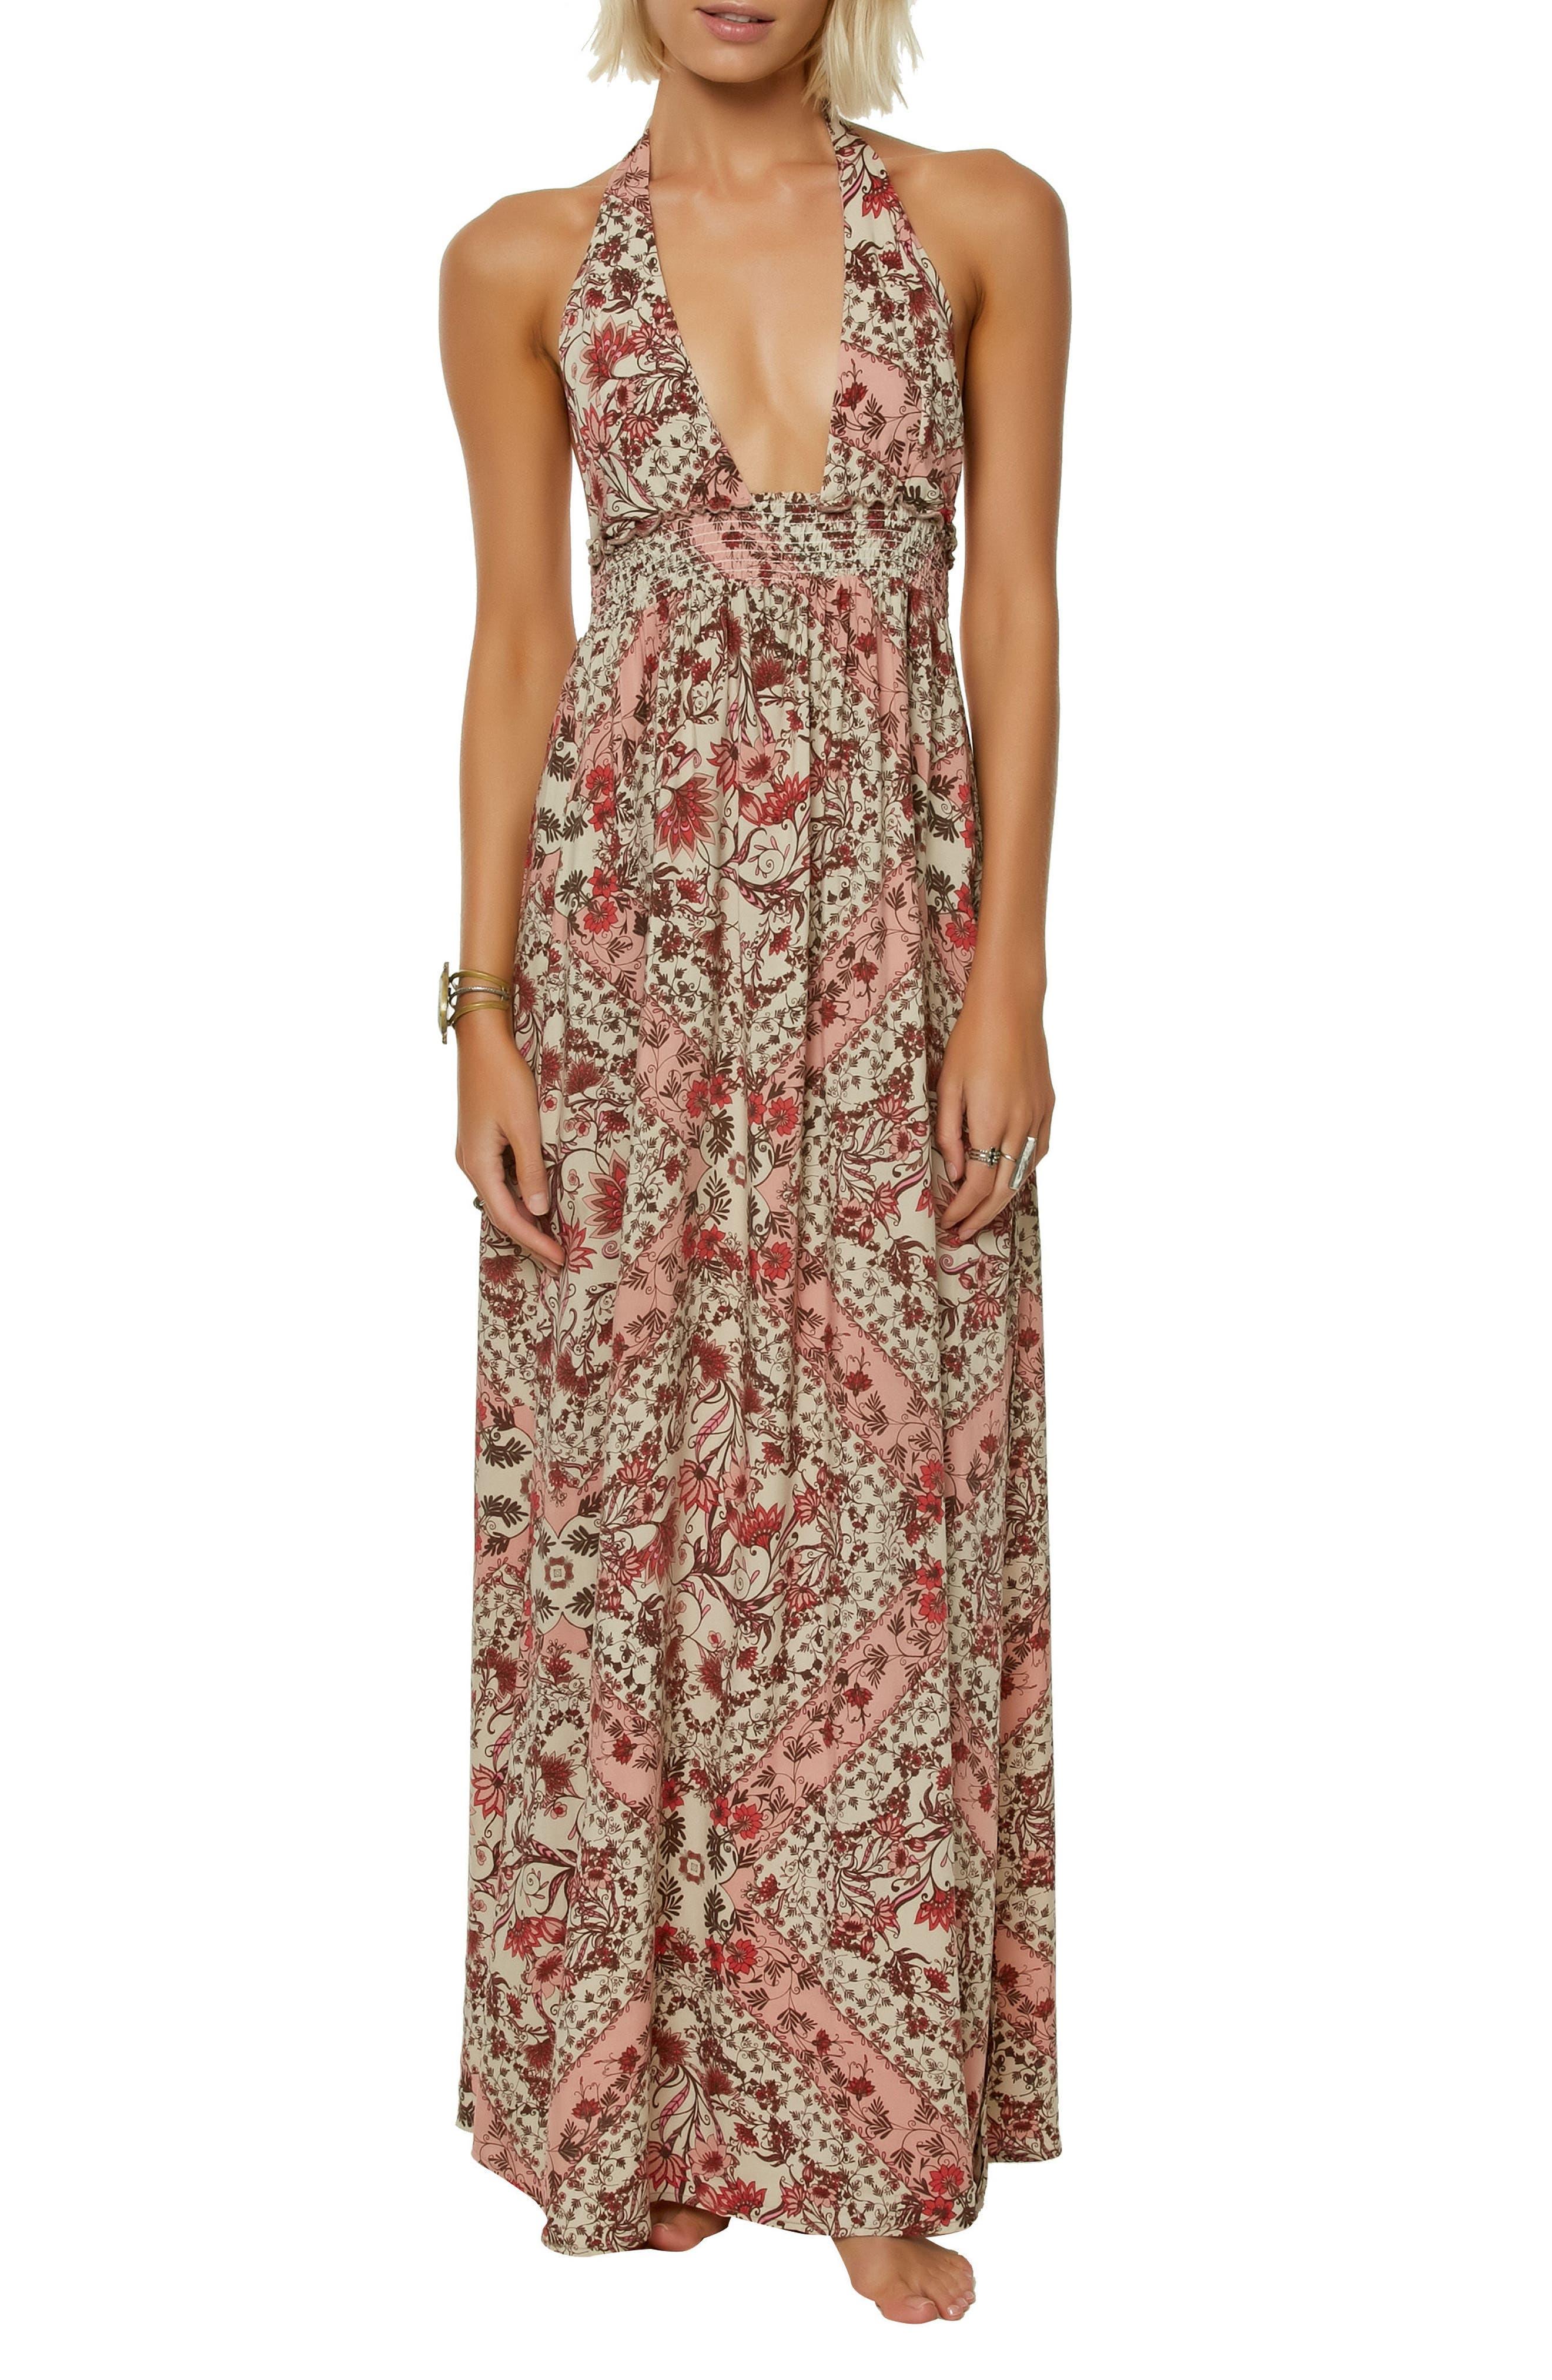 Dolley Halter Neck Maxi Dress,                         Main,                         color, CAF CREME